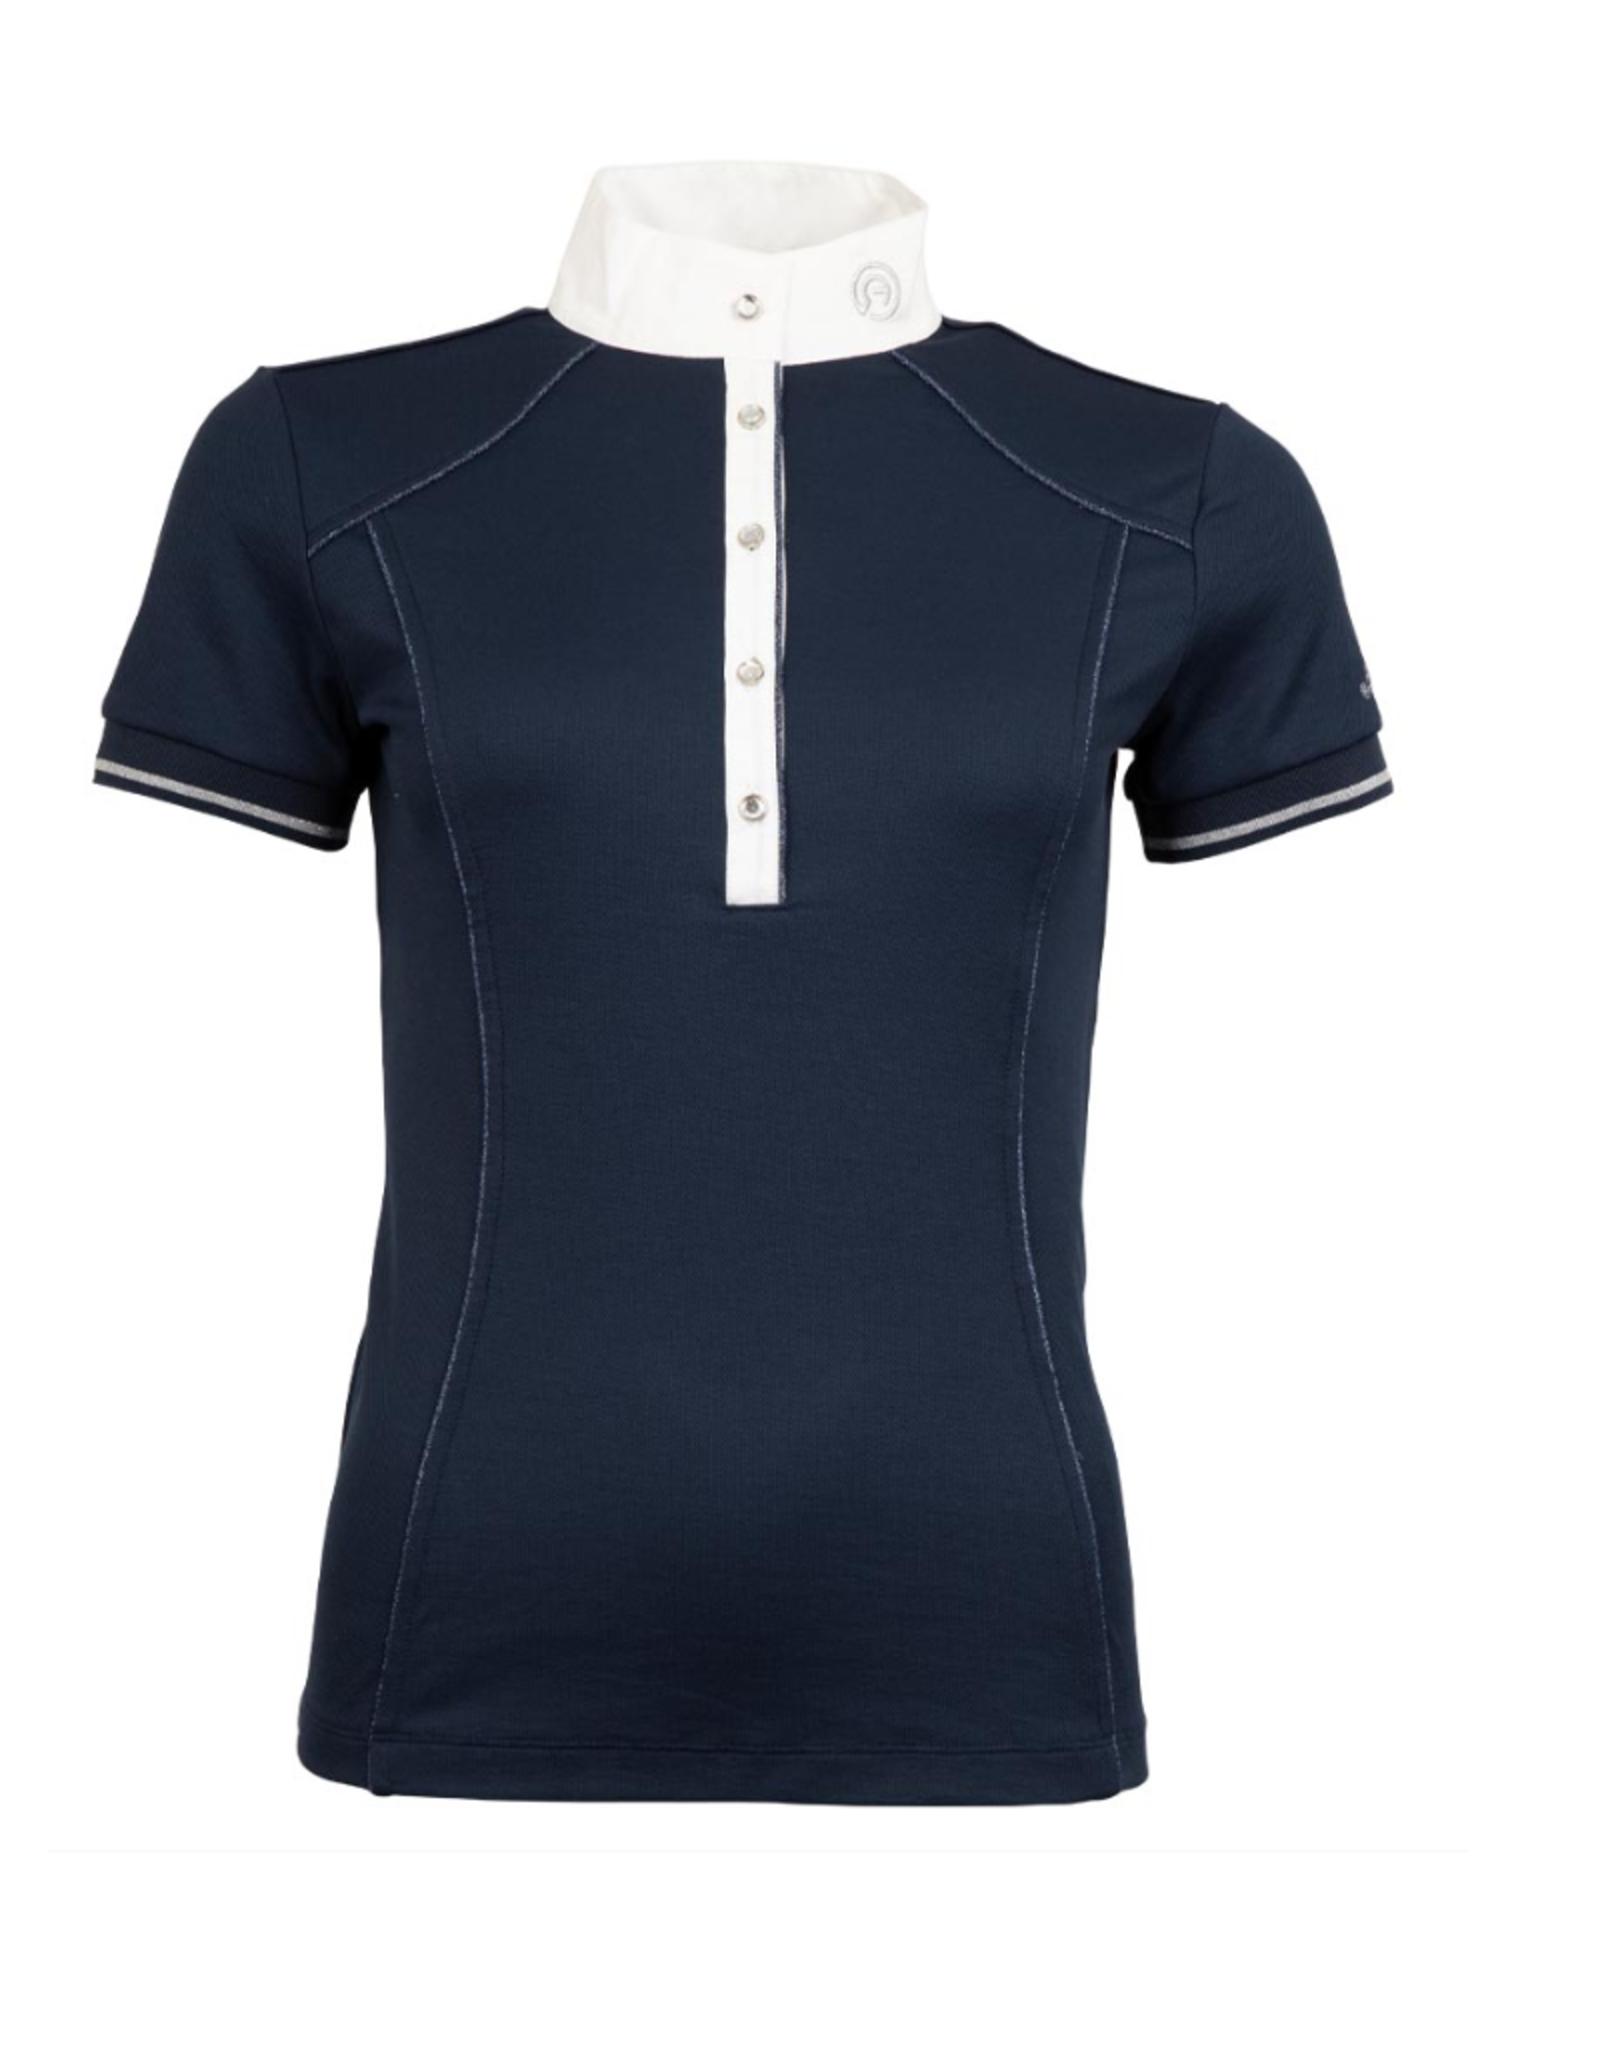 Anky Anky A67580 Dames Wedstrijd Shirt